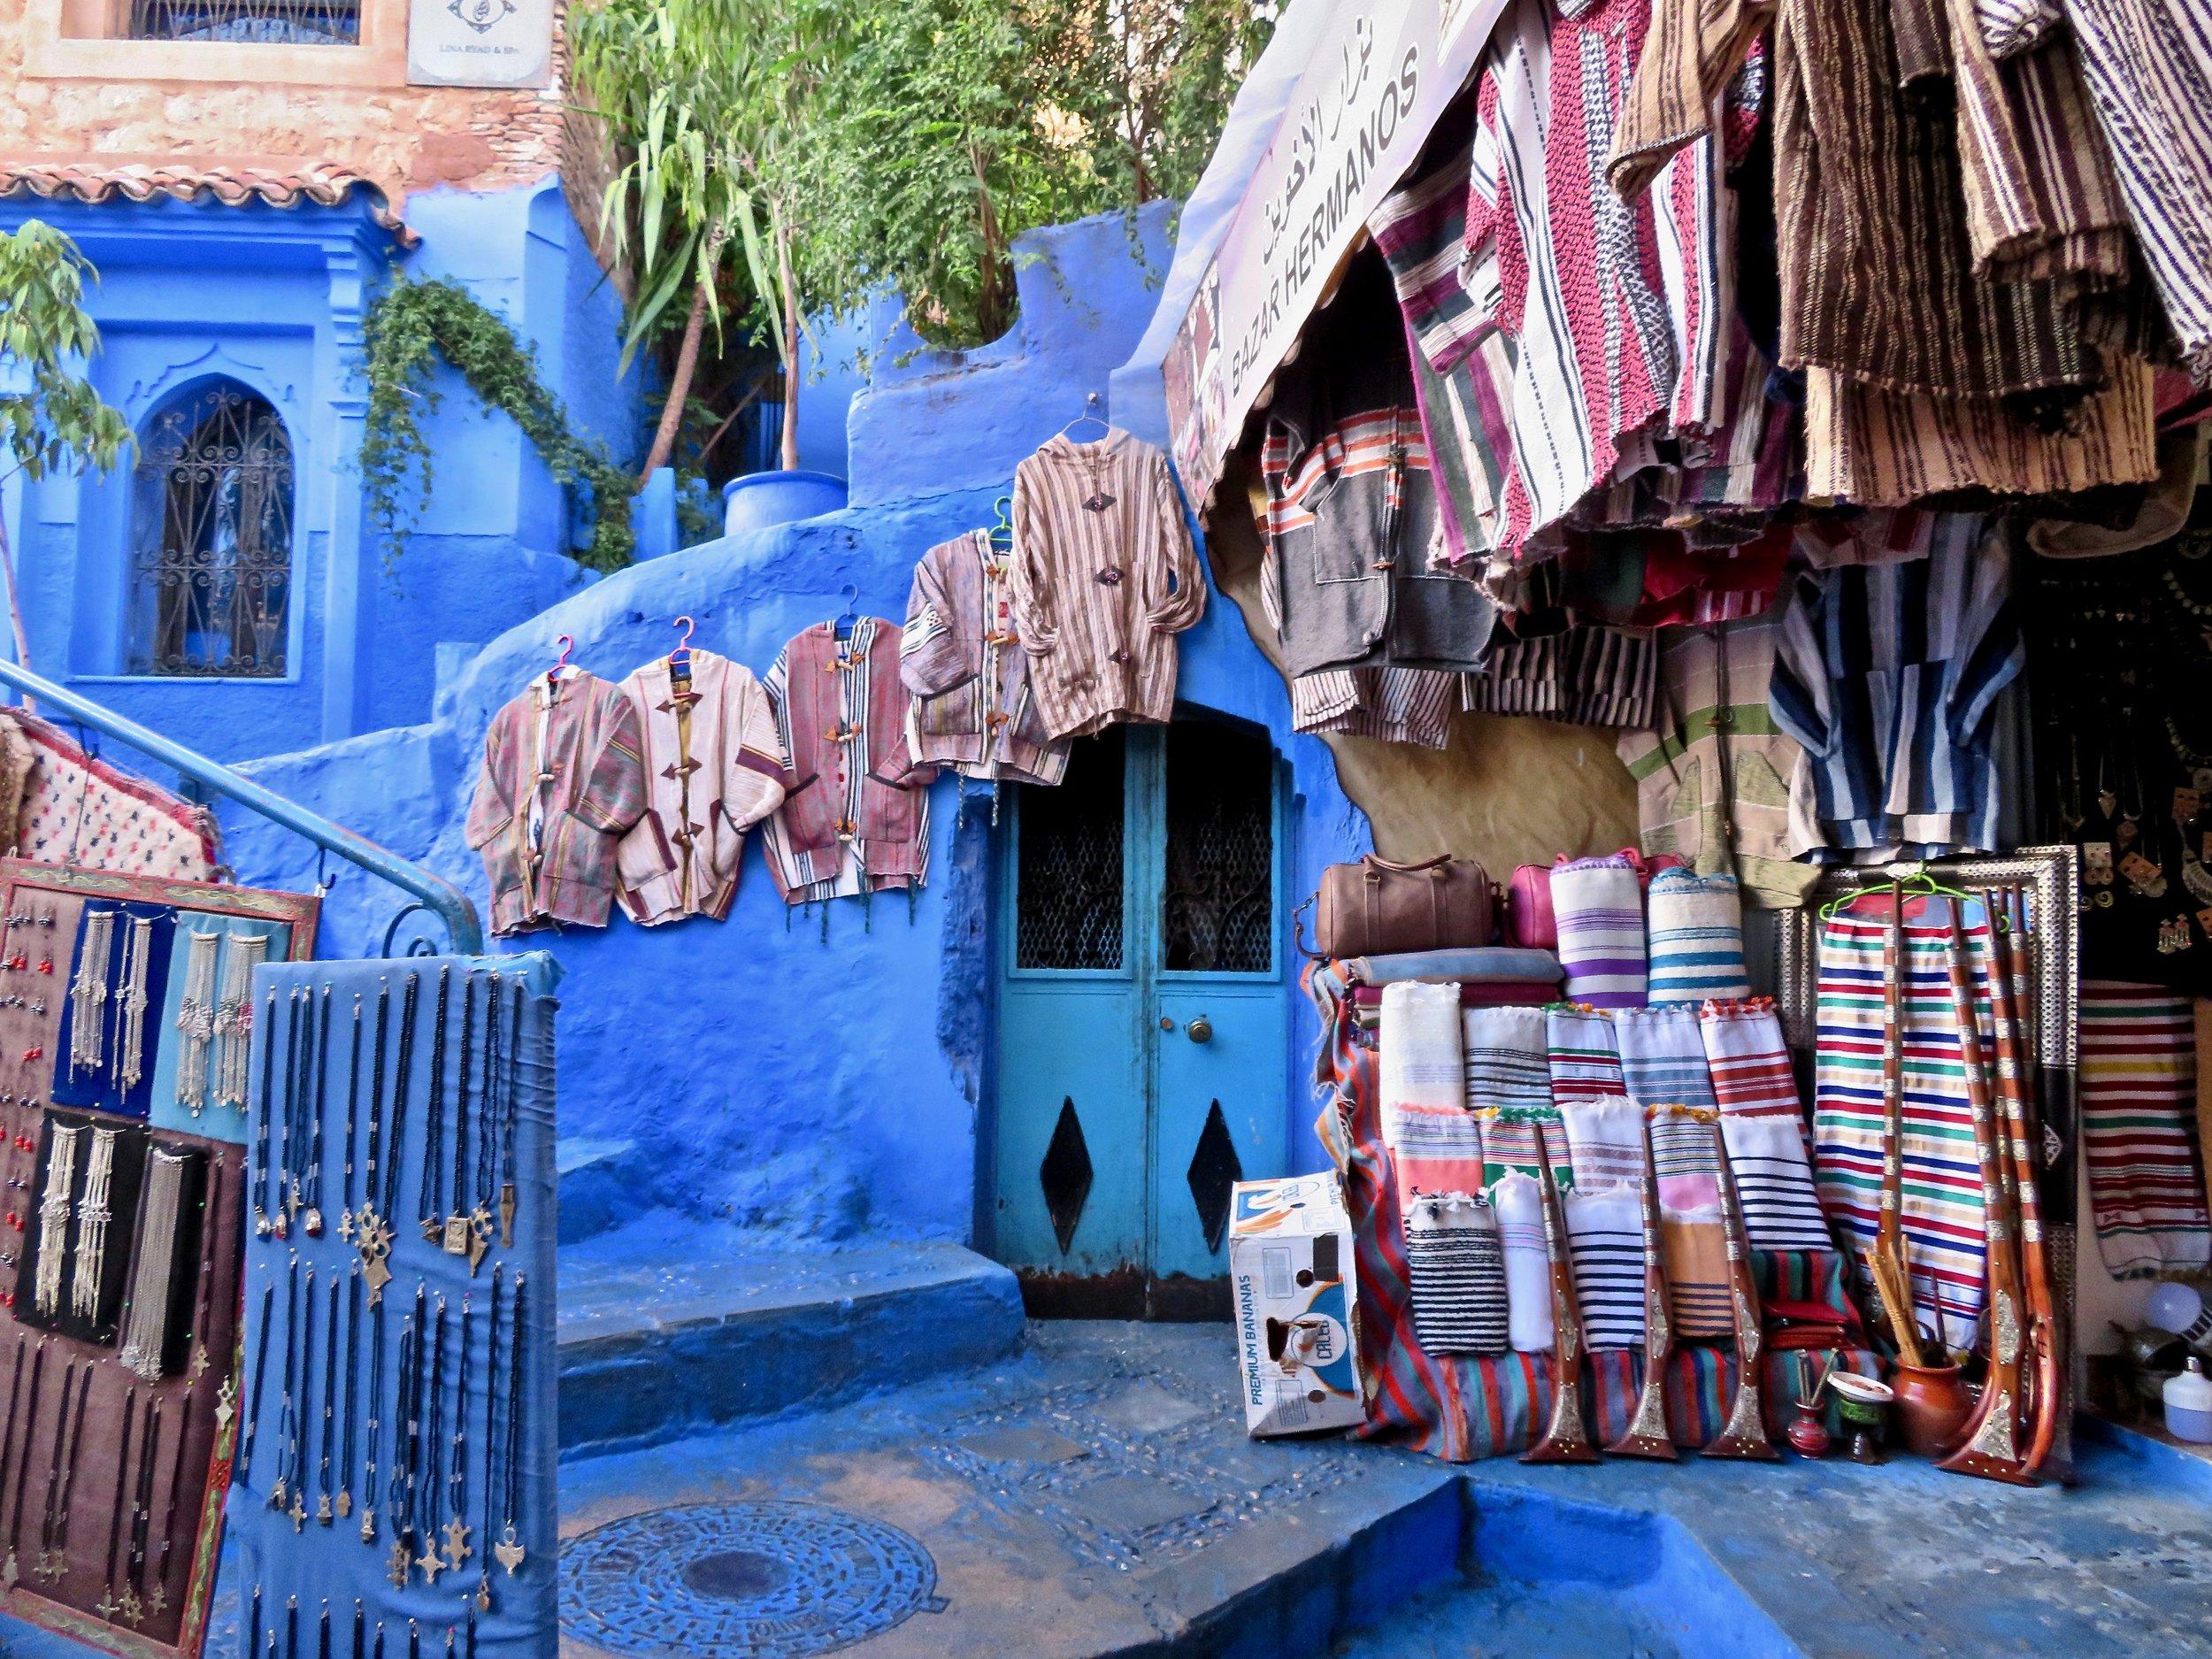 Chefchaoen shops line the blue streets